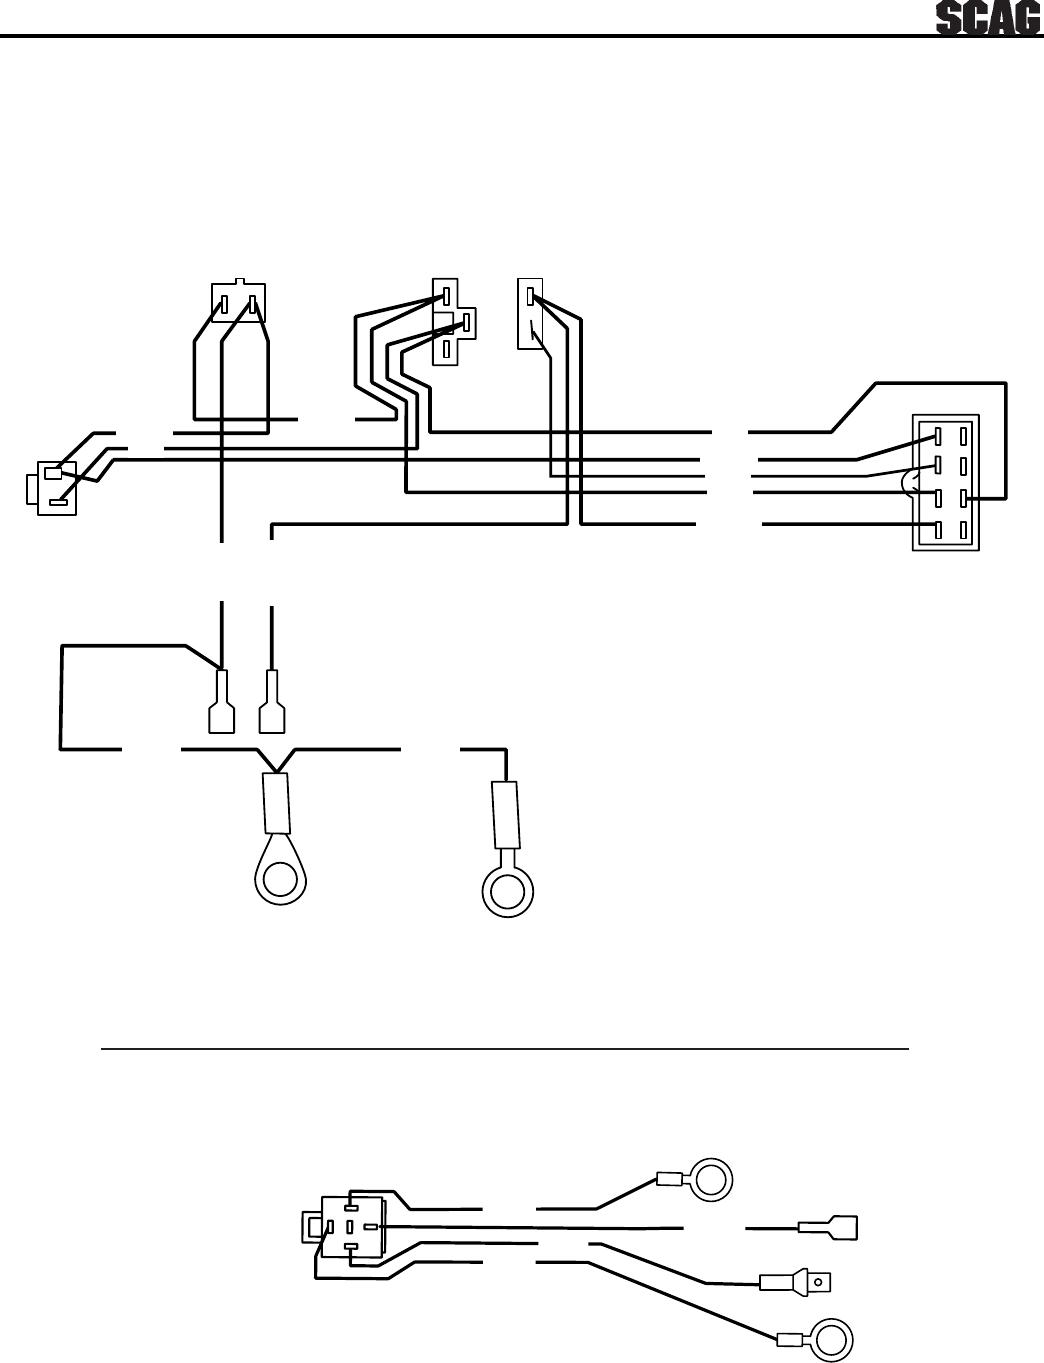 Scag Power Equipment Swz Users Manual 96 Op Man Section Kawasaki Fc420v 14 Hp Wiring Diagram 33